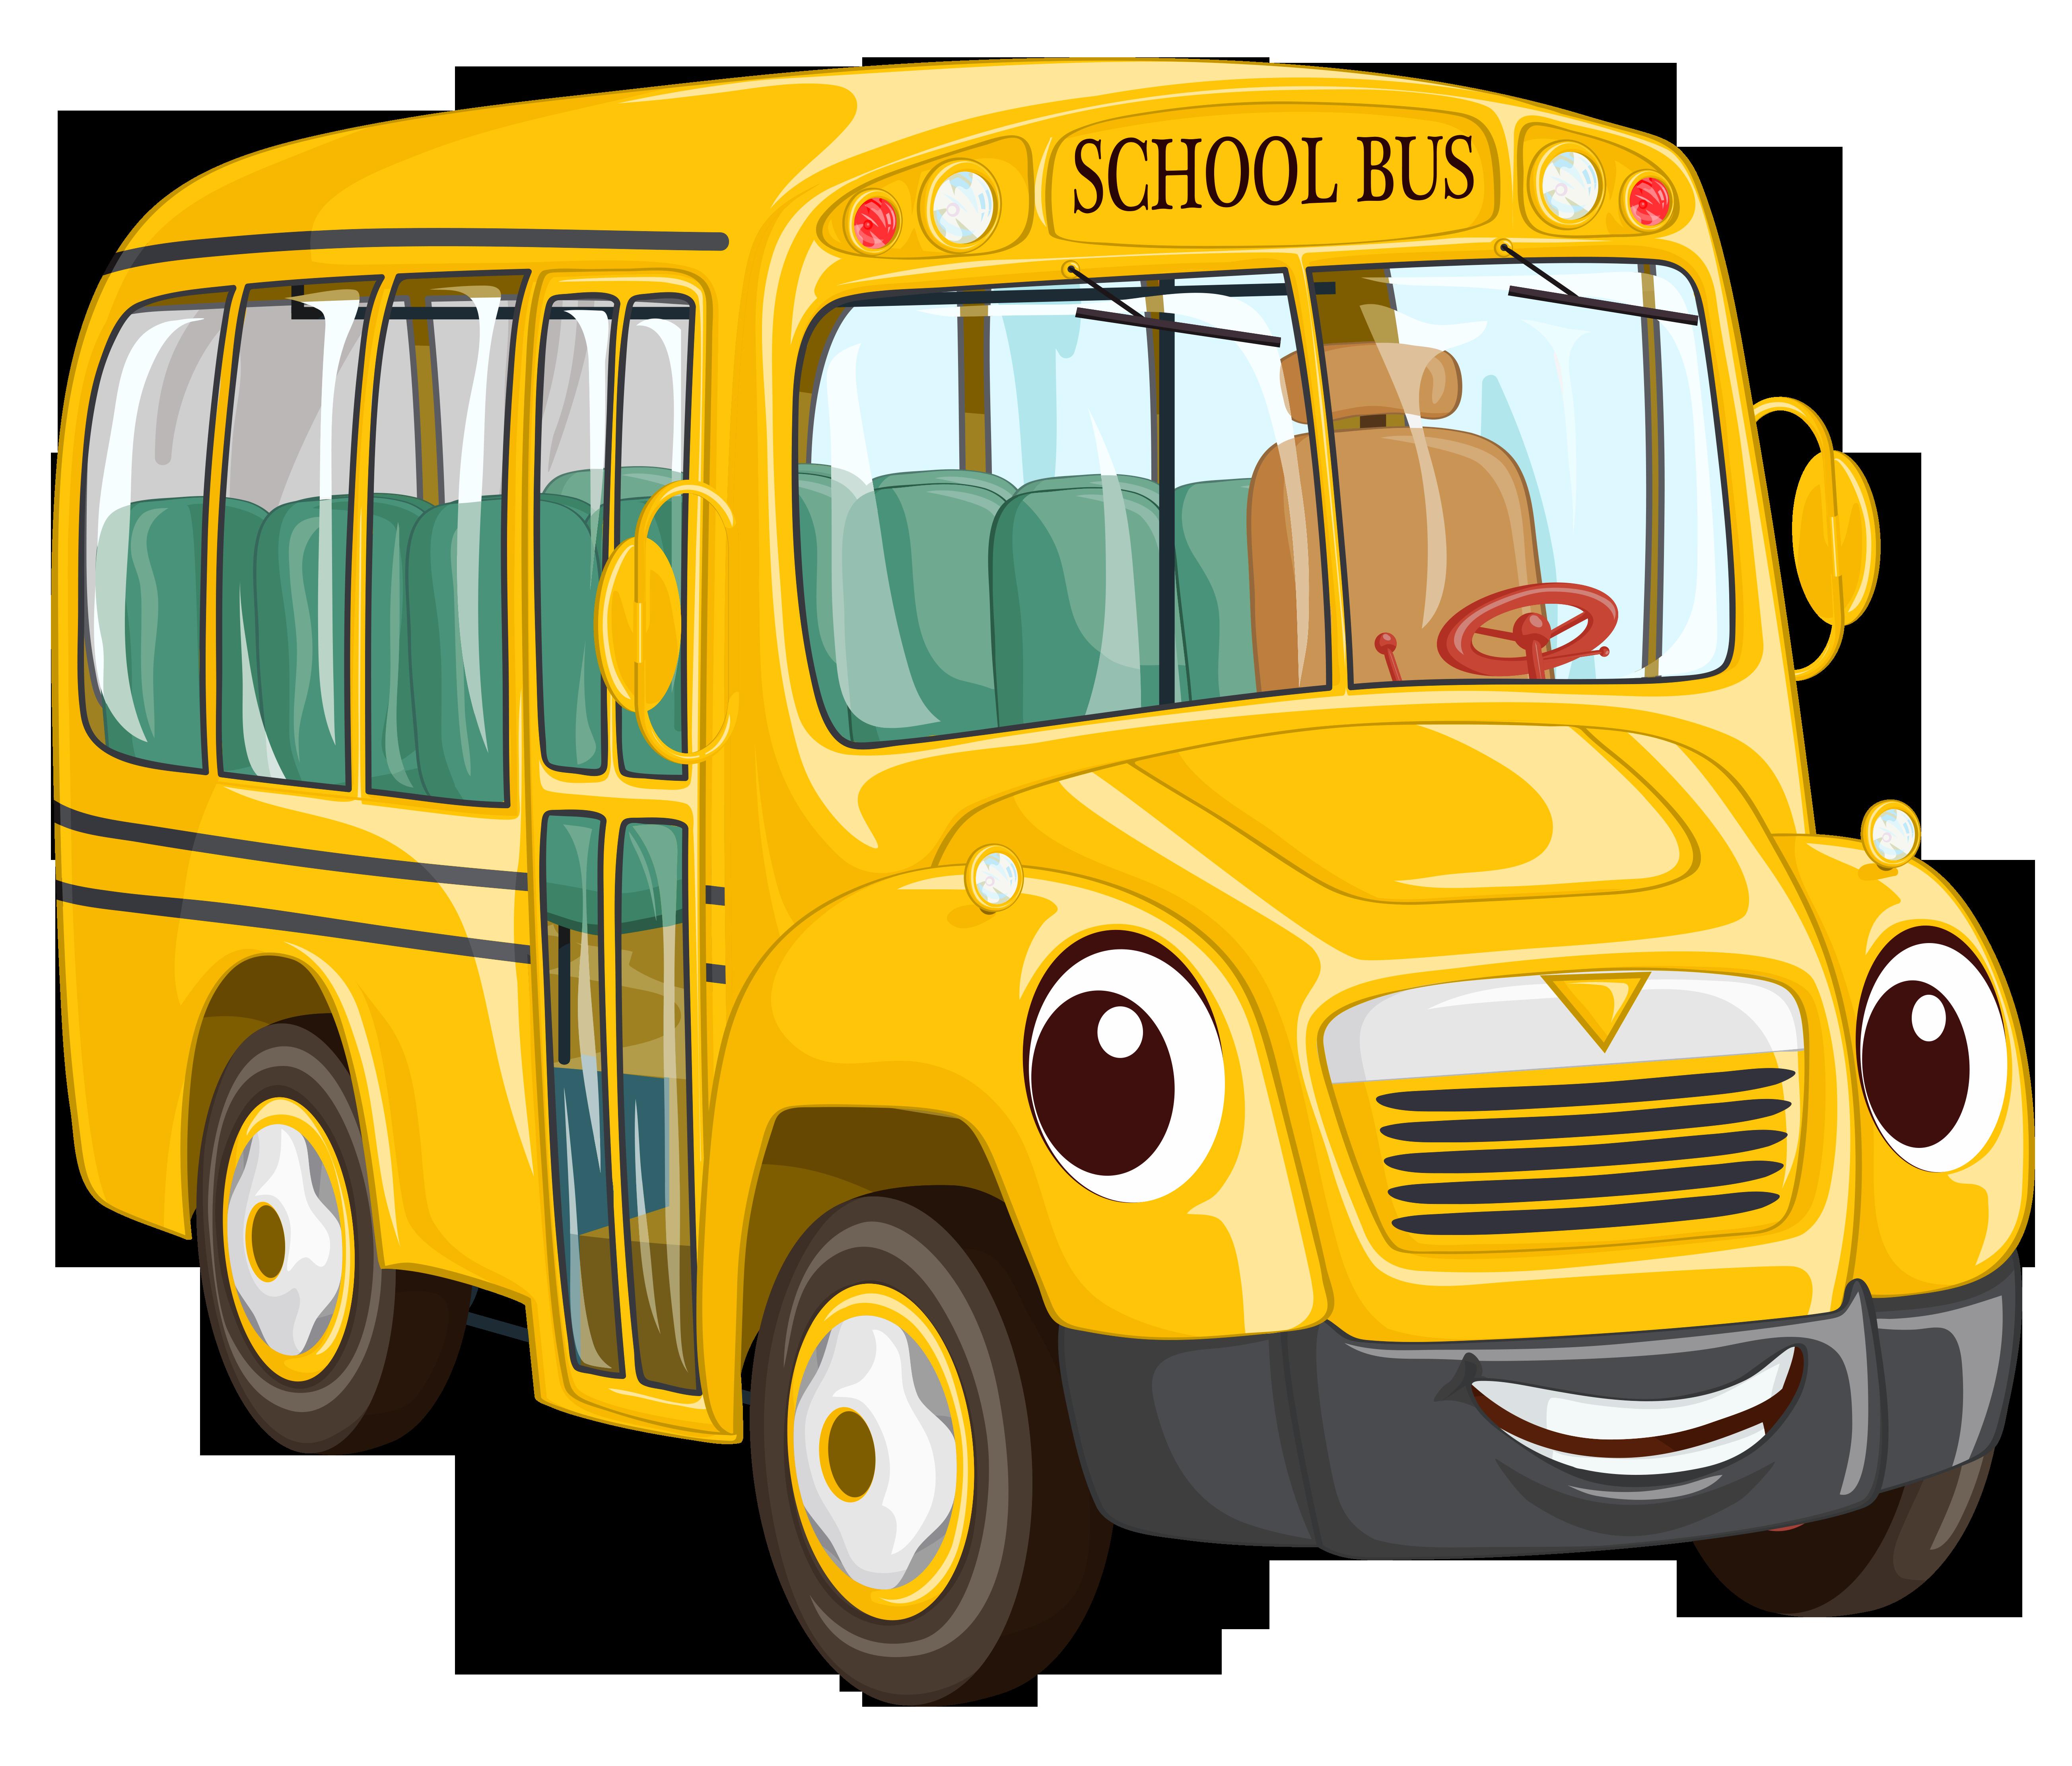 5210x4440 School Bus Clipart Images 3 School Bus Clip Art Vector 5 2